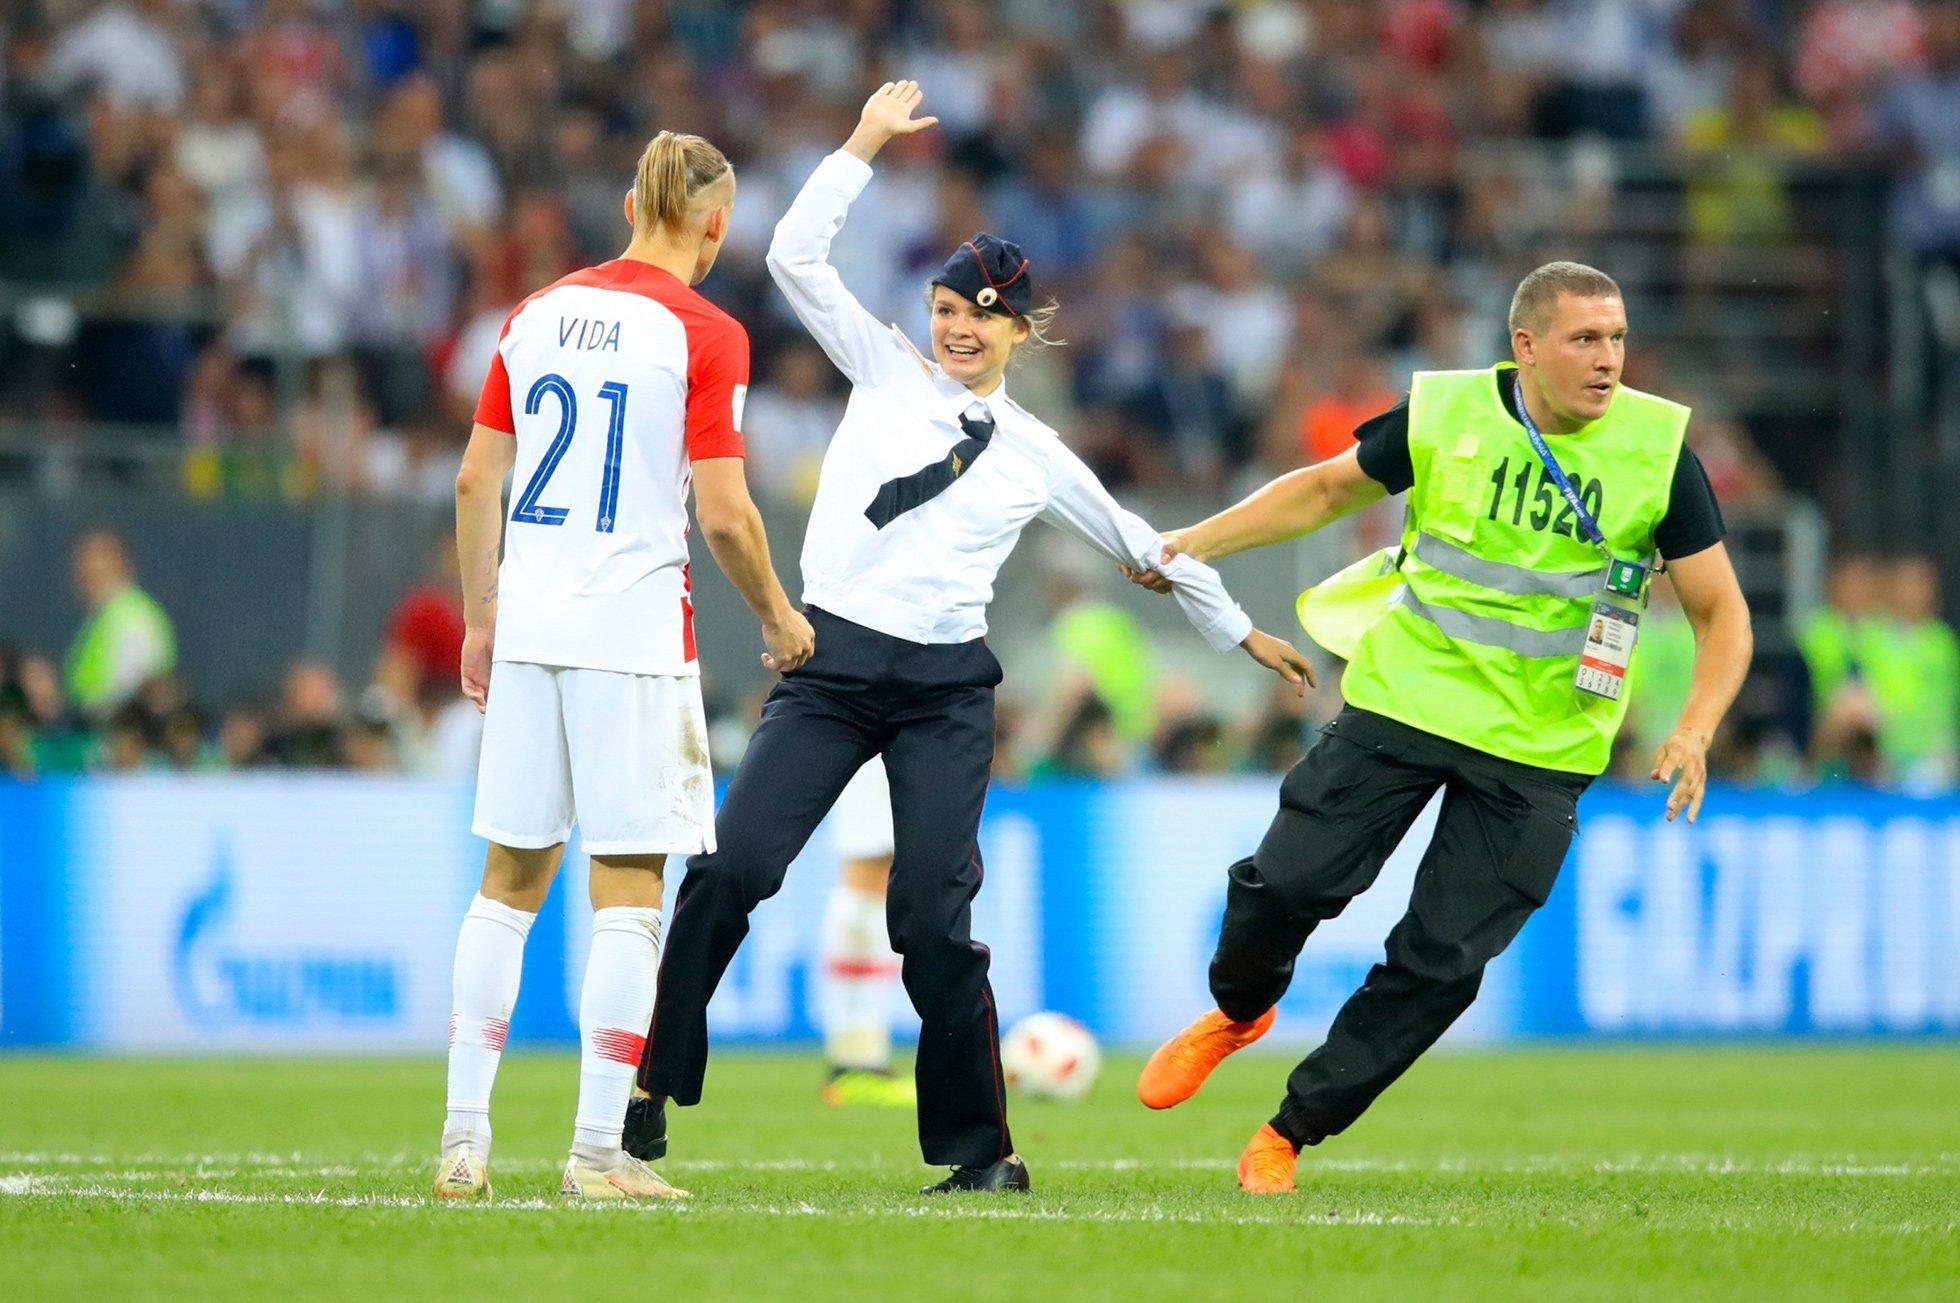 Pussy Riot На матче Франция Хорватия